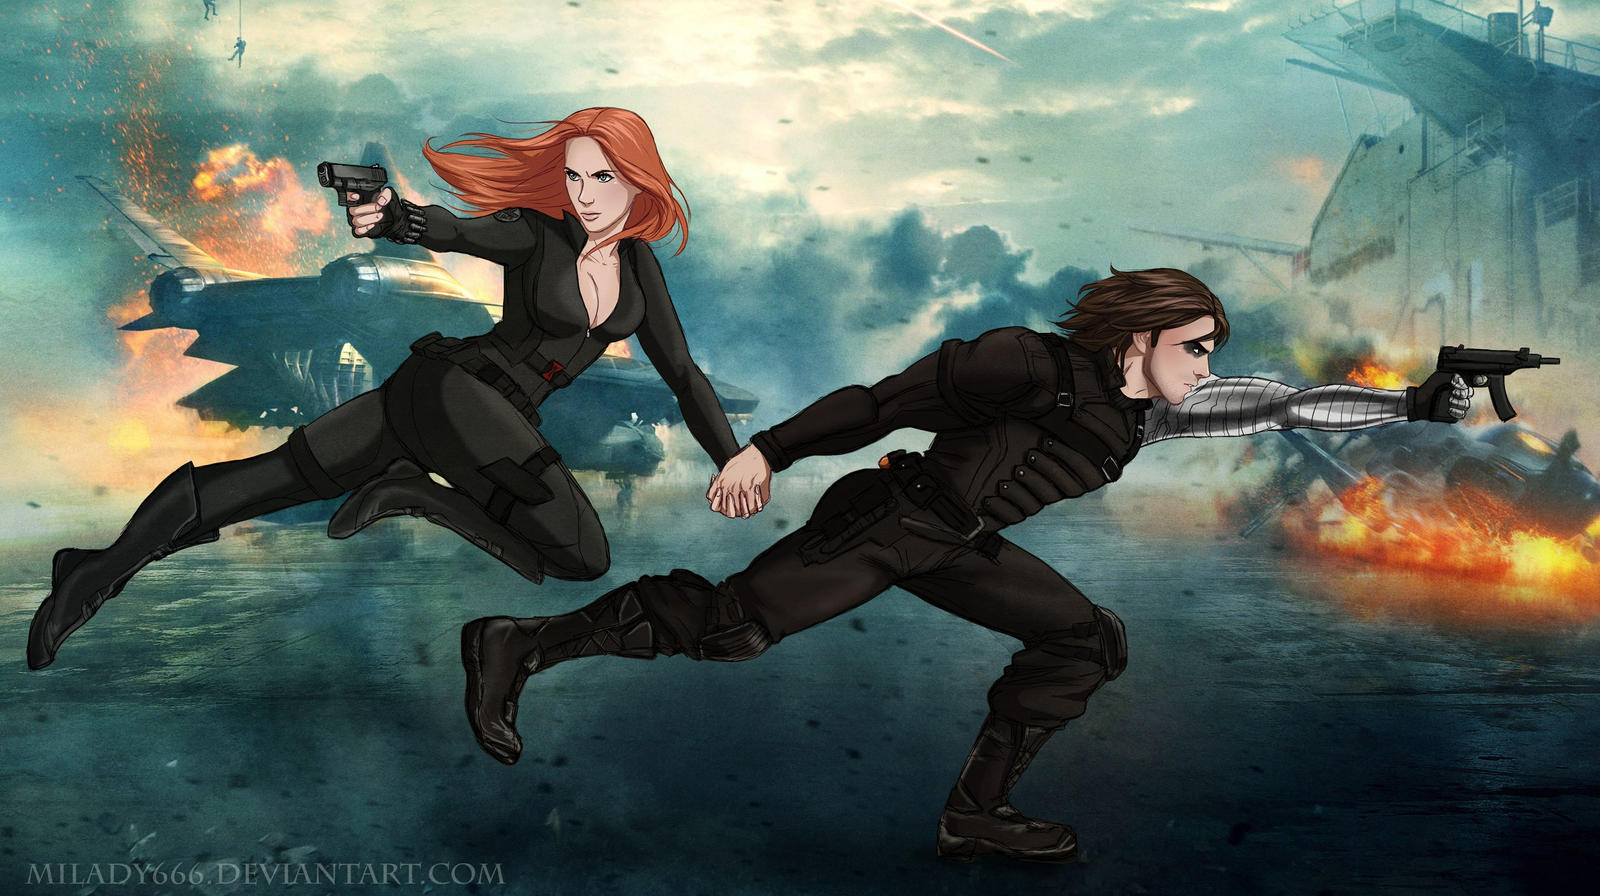 Pubg By Sodano On Deviantart: Fight Together By Milady666 On DeviantArt